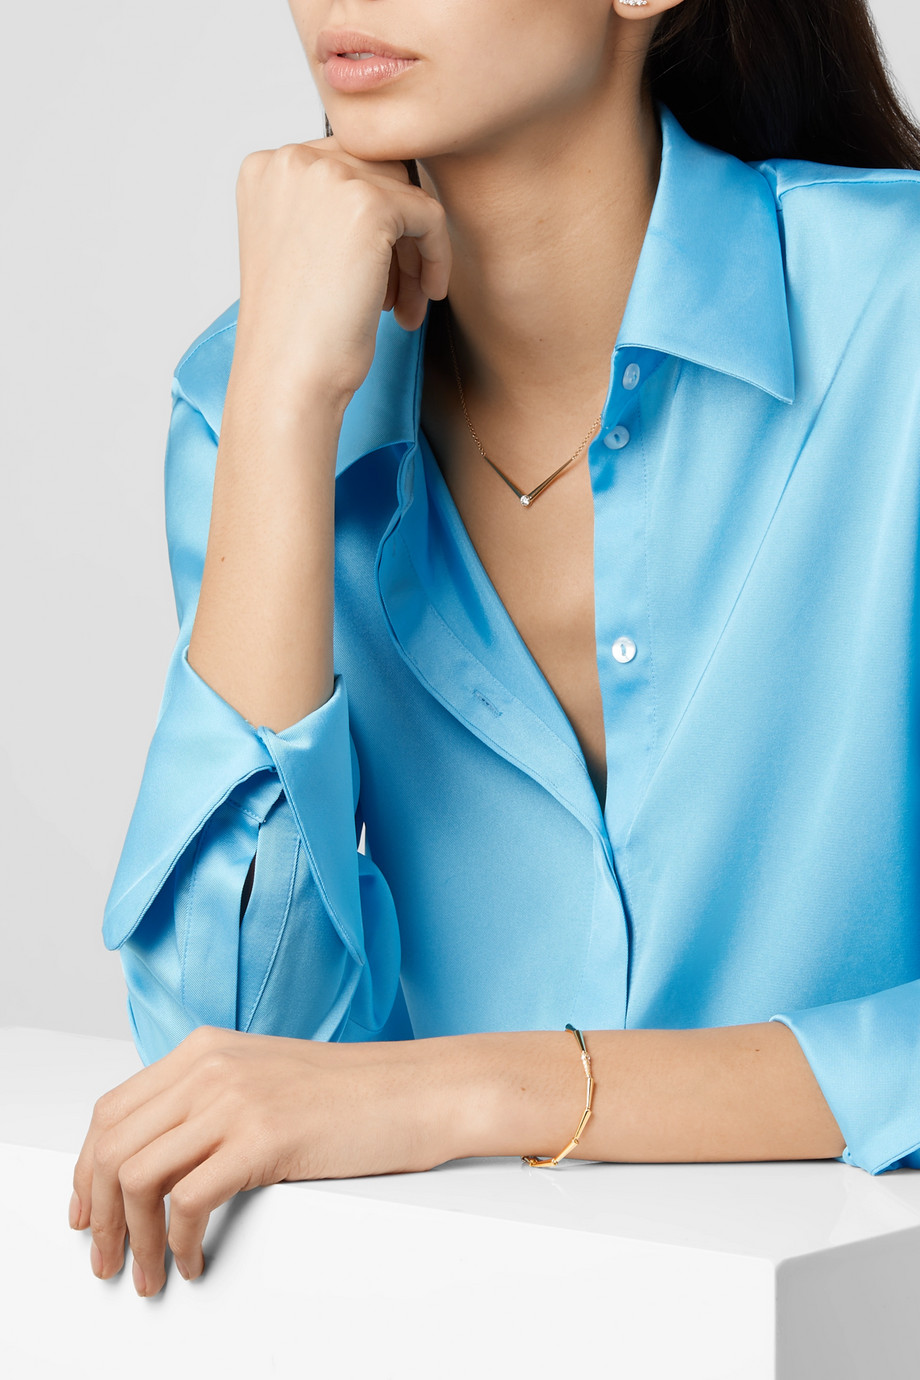 Melissa Kaye Lola 18-karat gold diamond bracelet